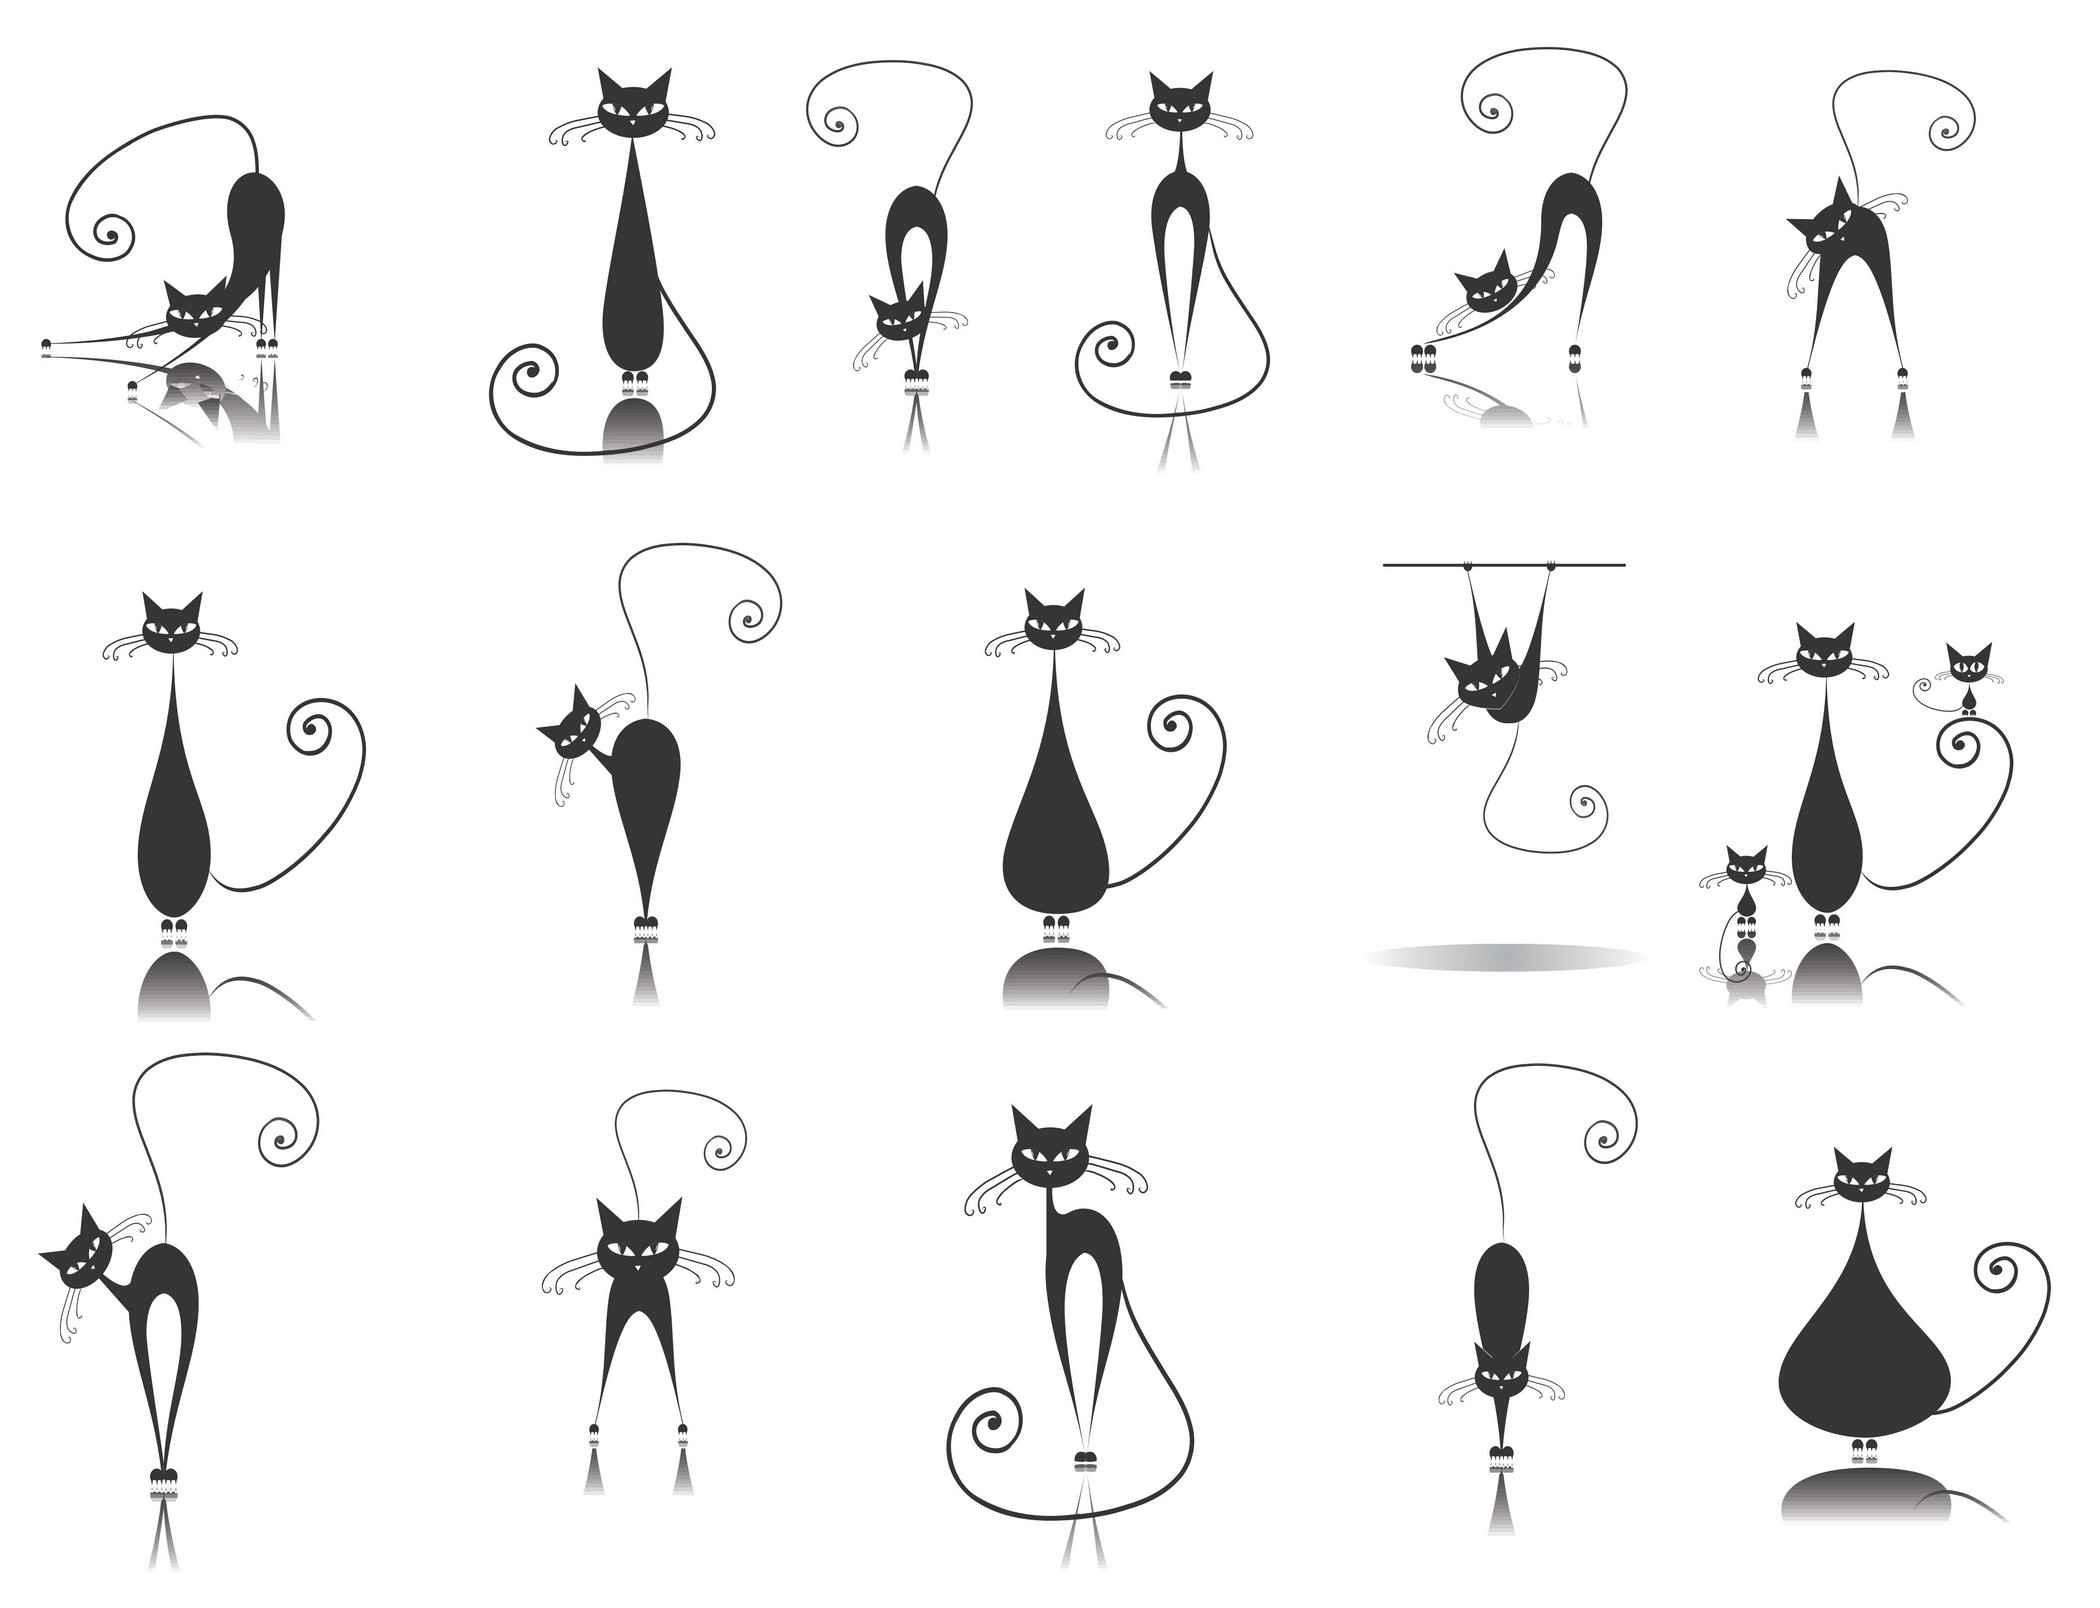 Cute cartoon animals [Cats] png